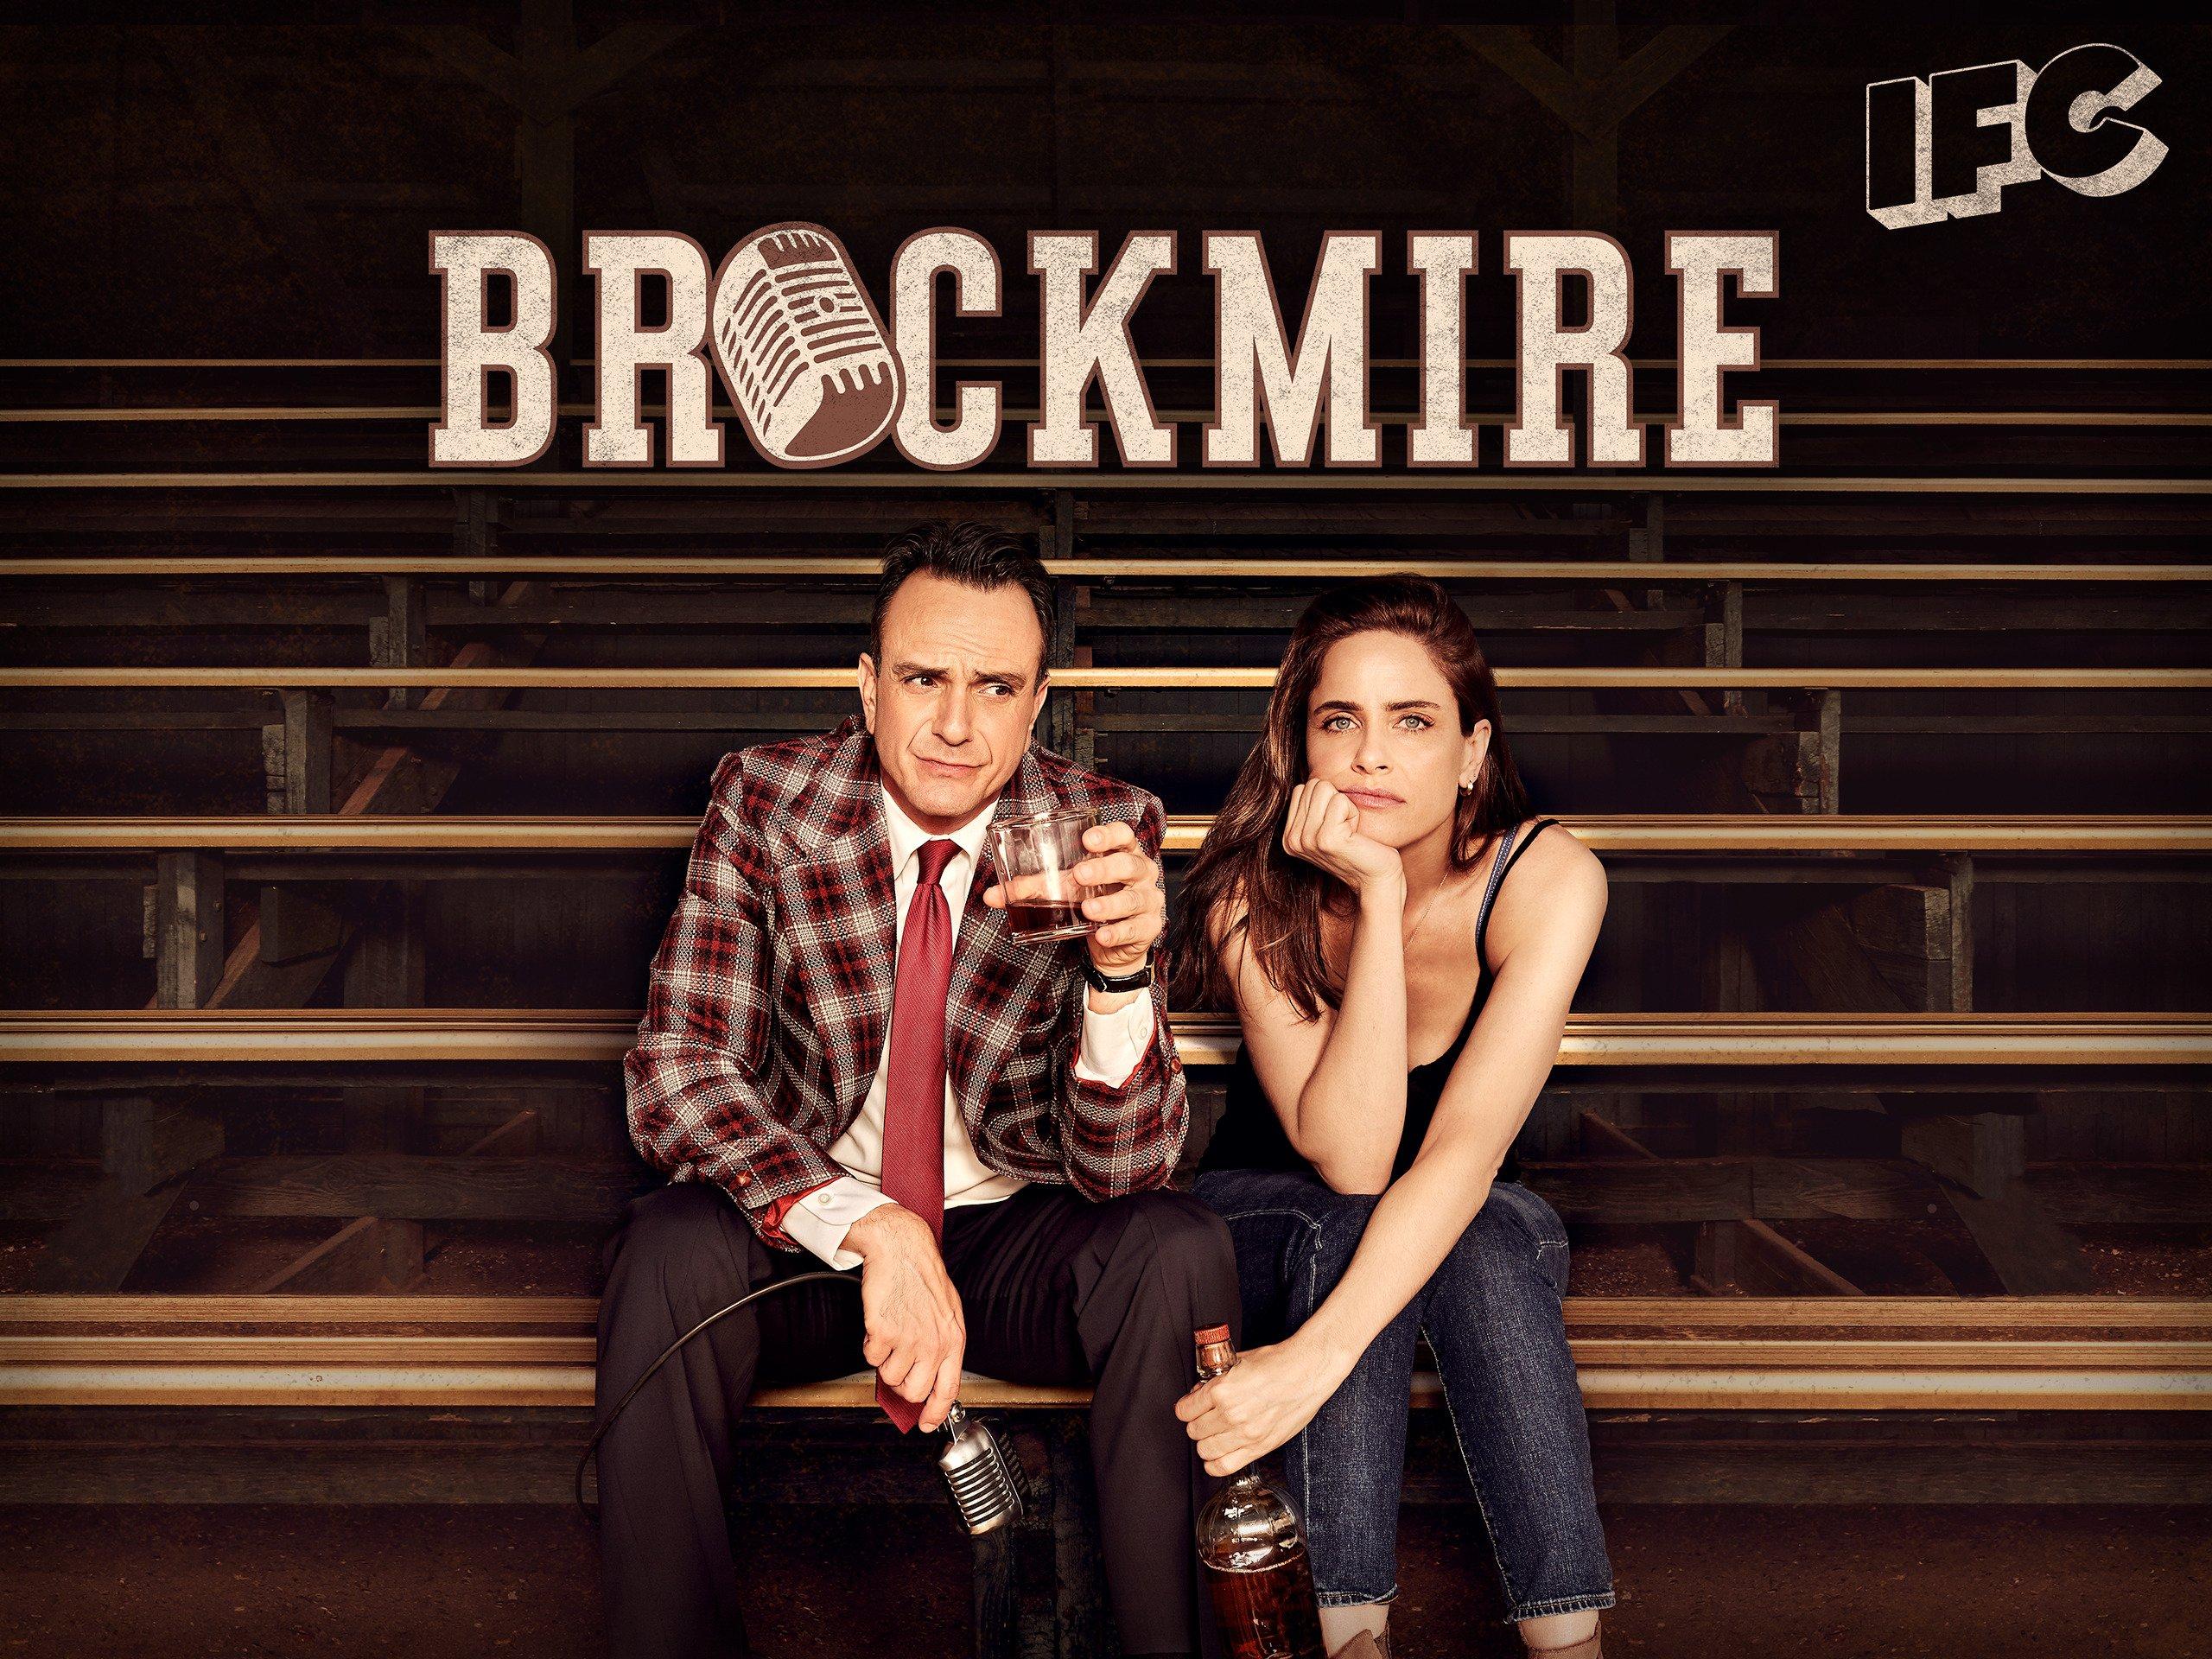 Amazoncom Brockmire Season 1 Amazon Digital Services Llc